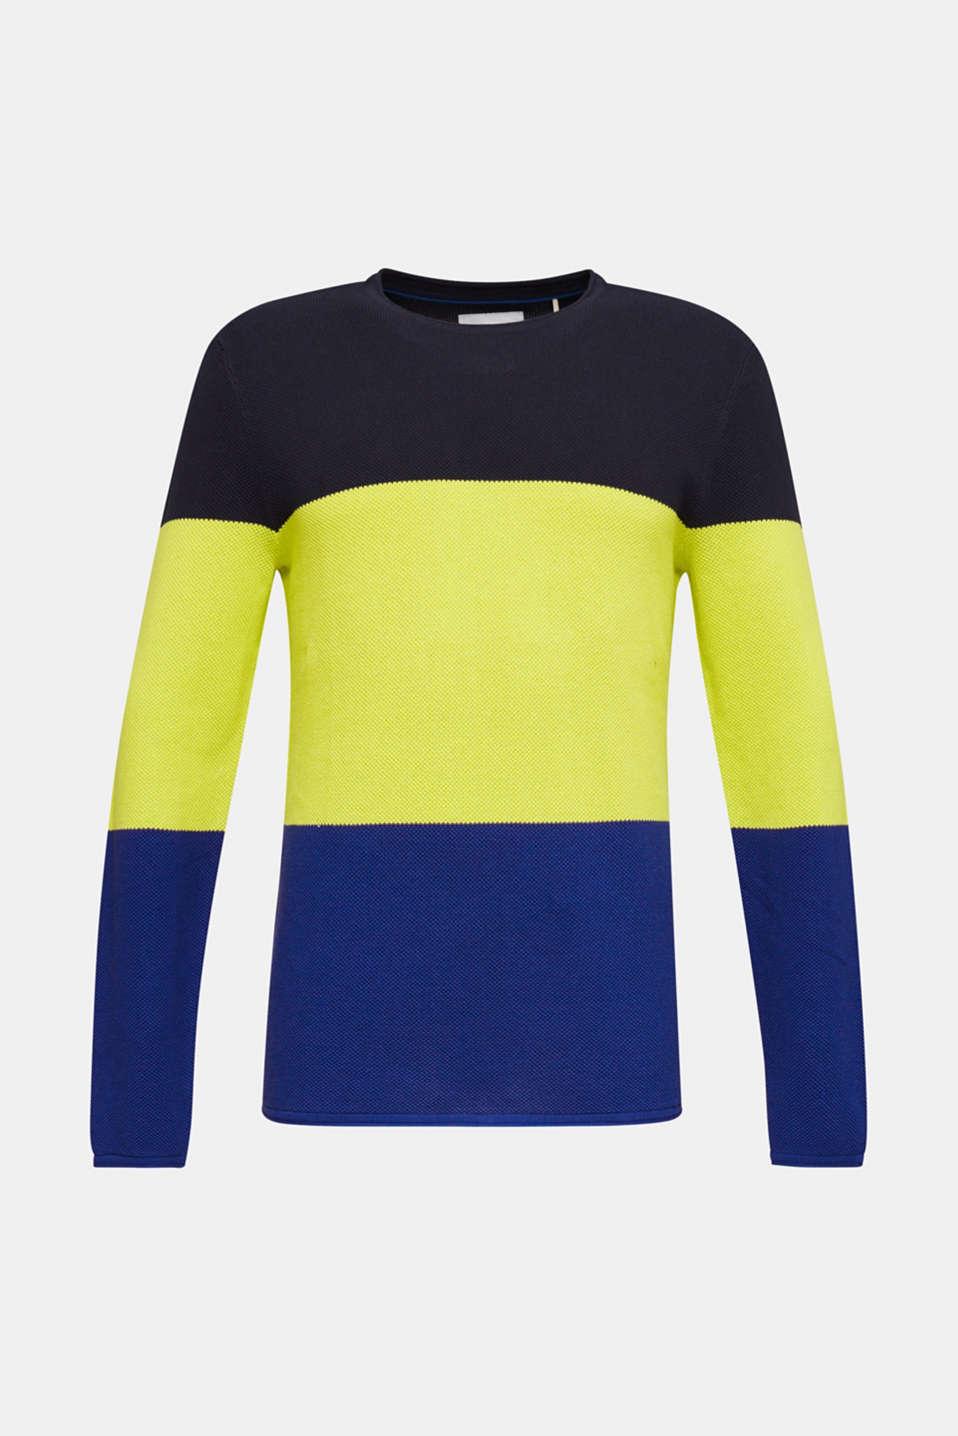 NEON block stripe jumper, 100% cotton, NAVY 3, detail image number 6